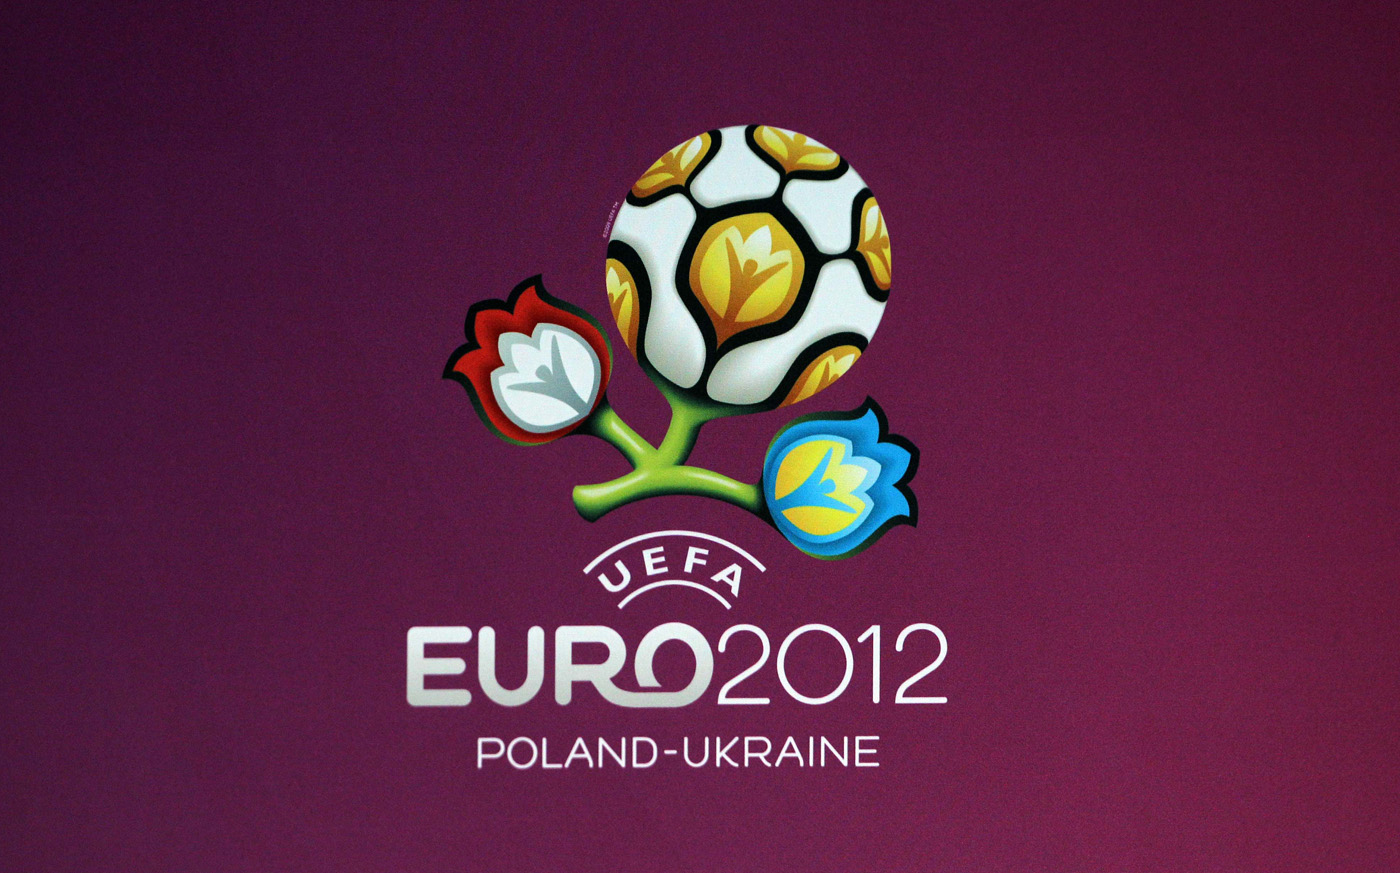 L'euro 2012 Poland Ukraine